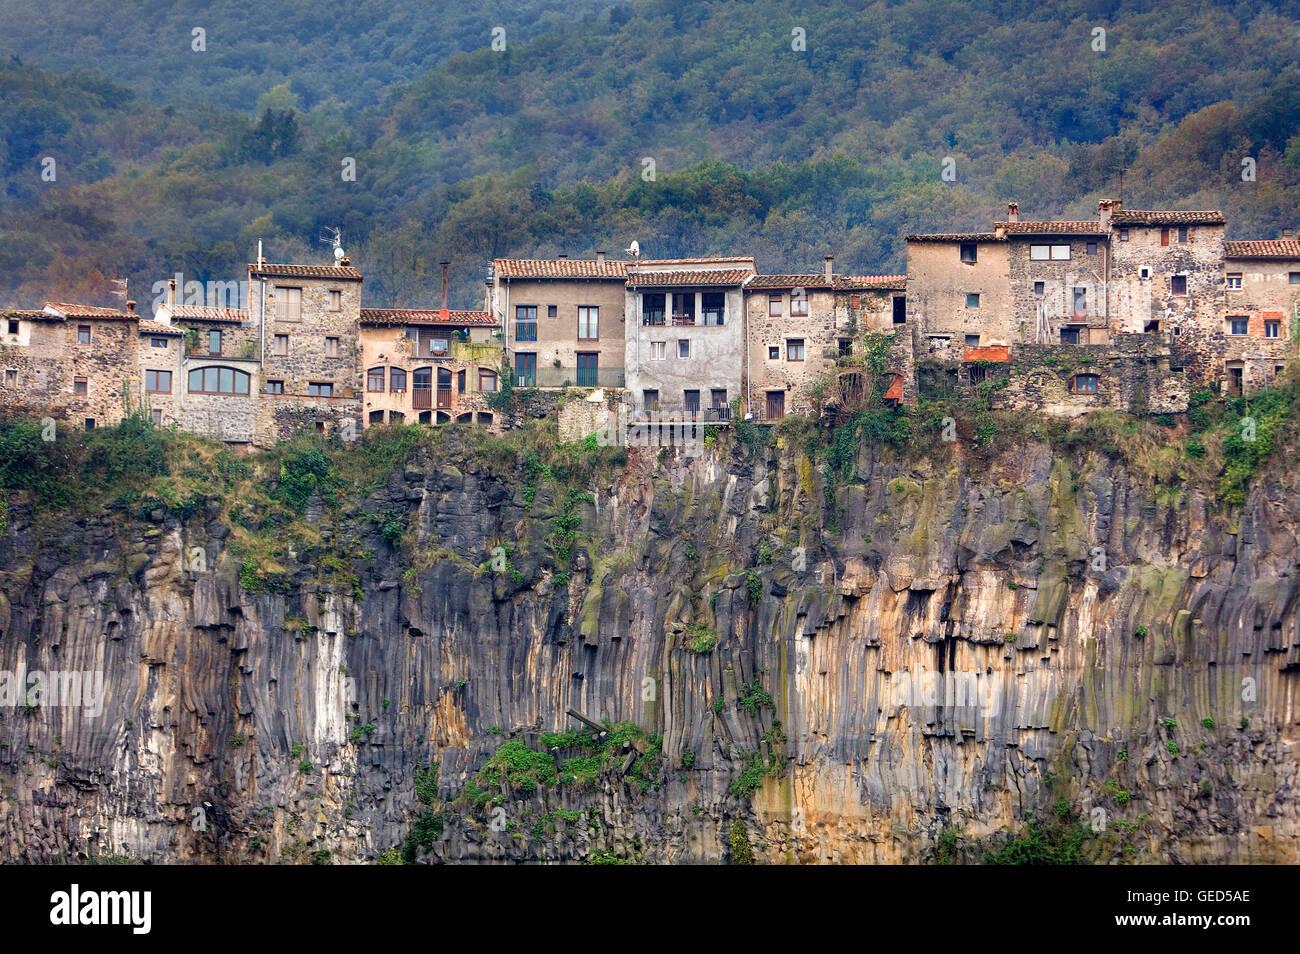 Castellfollit de la Roca,Girona province, Catalonia, Spain Stock Photo